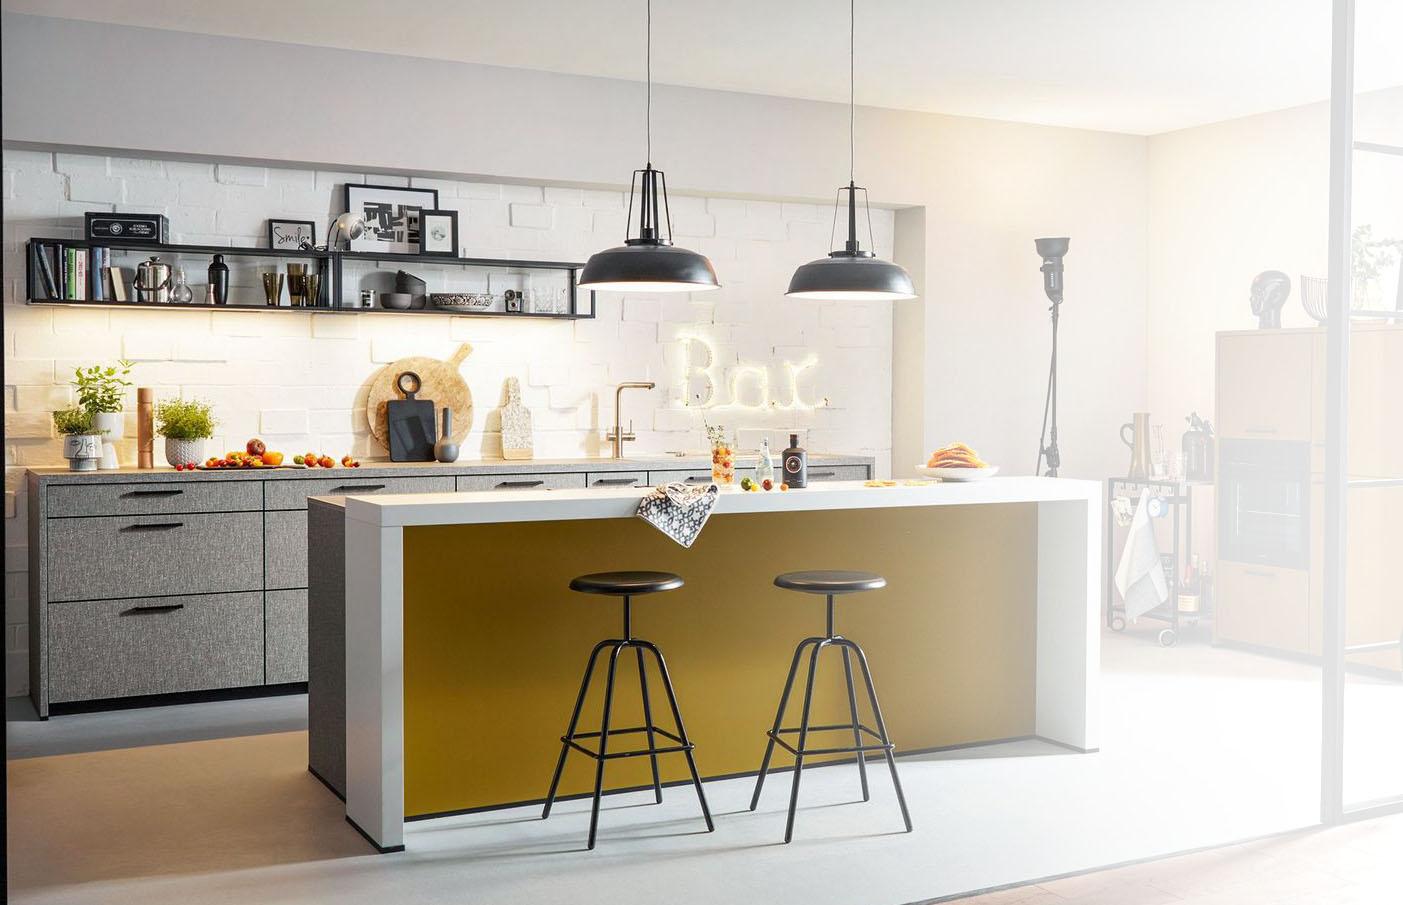 schuller-kitchens-banner